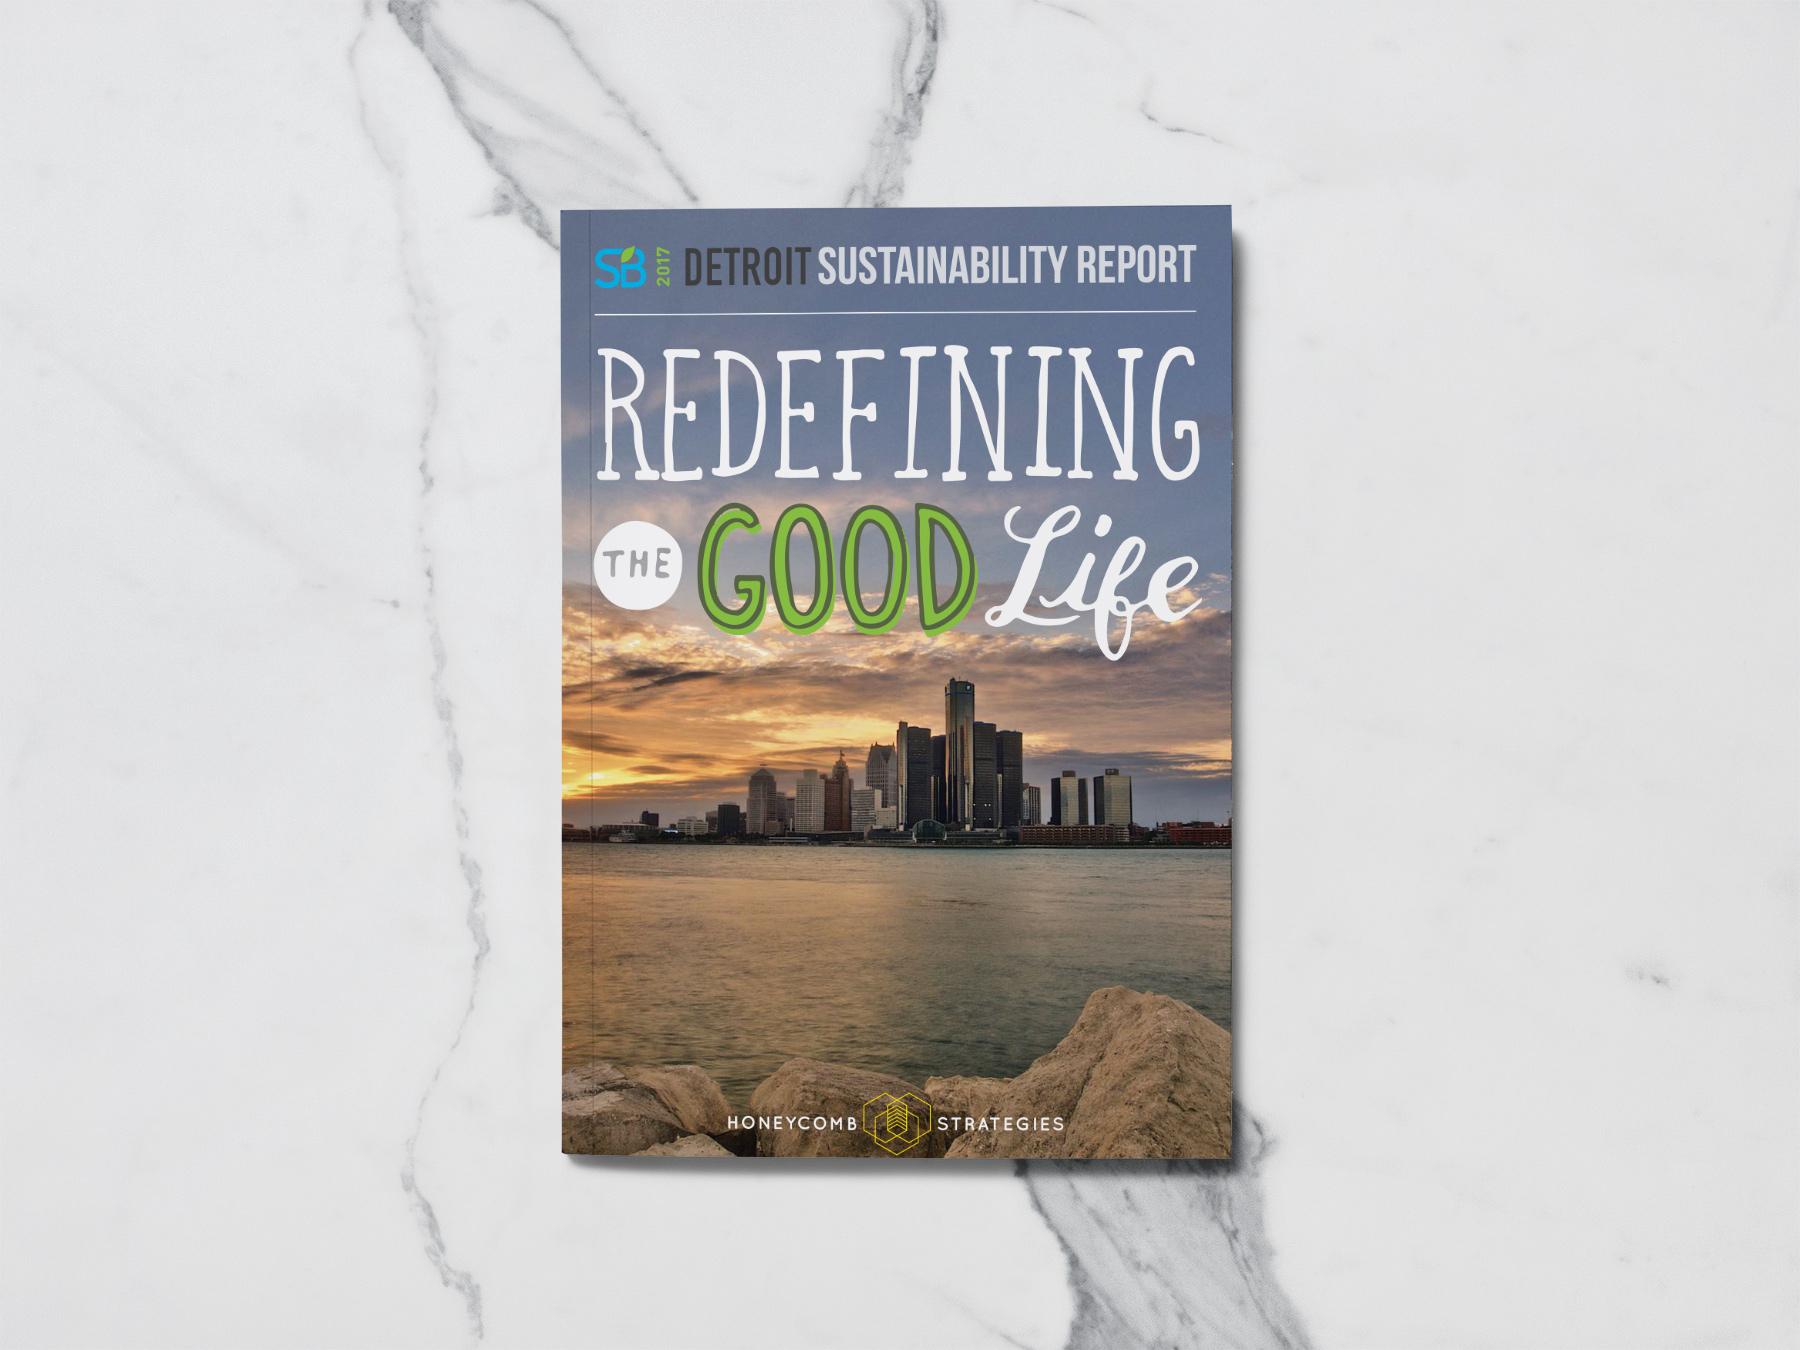 Redefining the Good Life - SB Detroit Sustainabiity Report